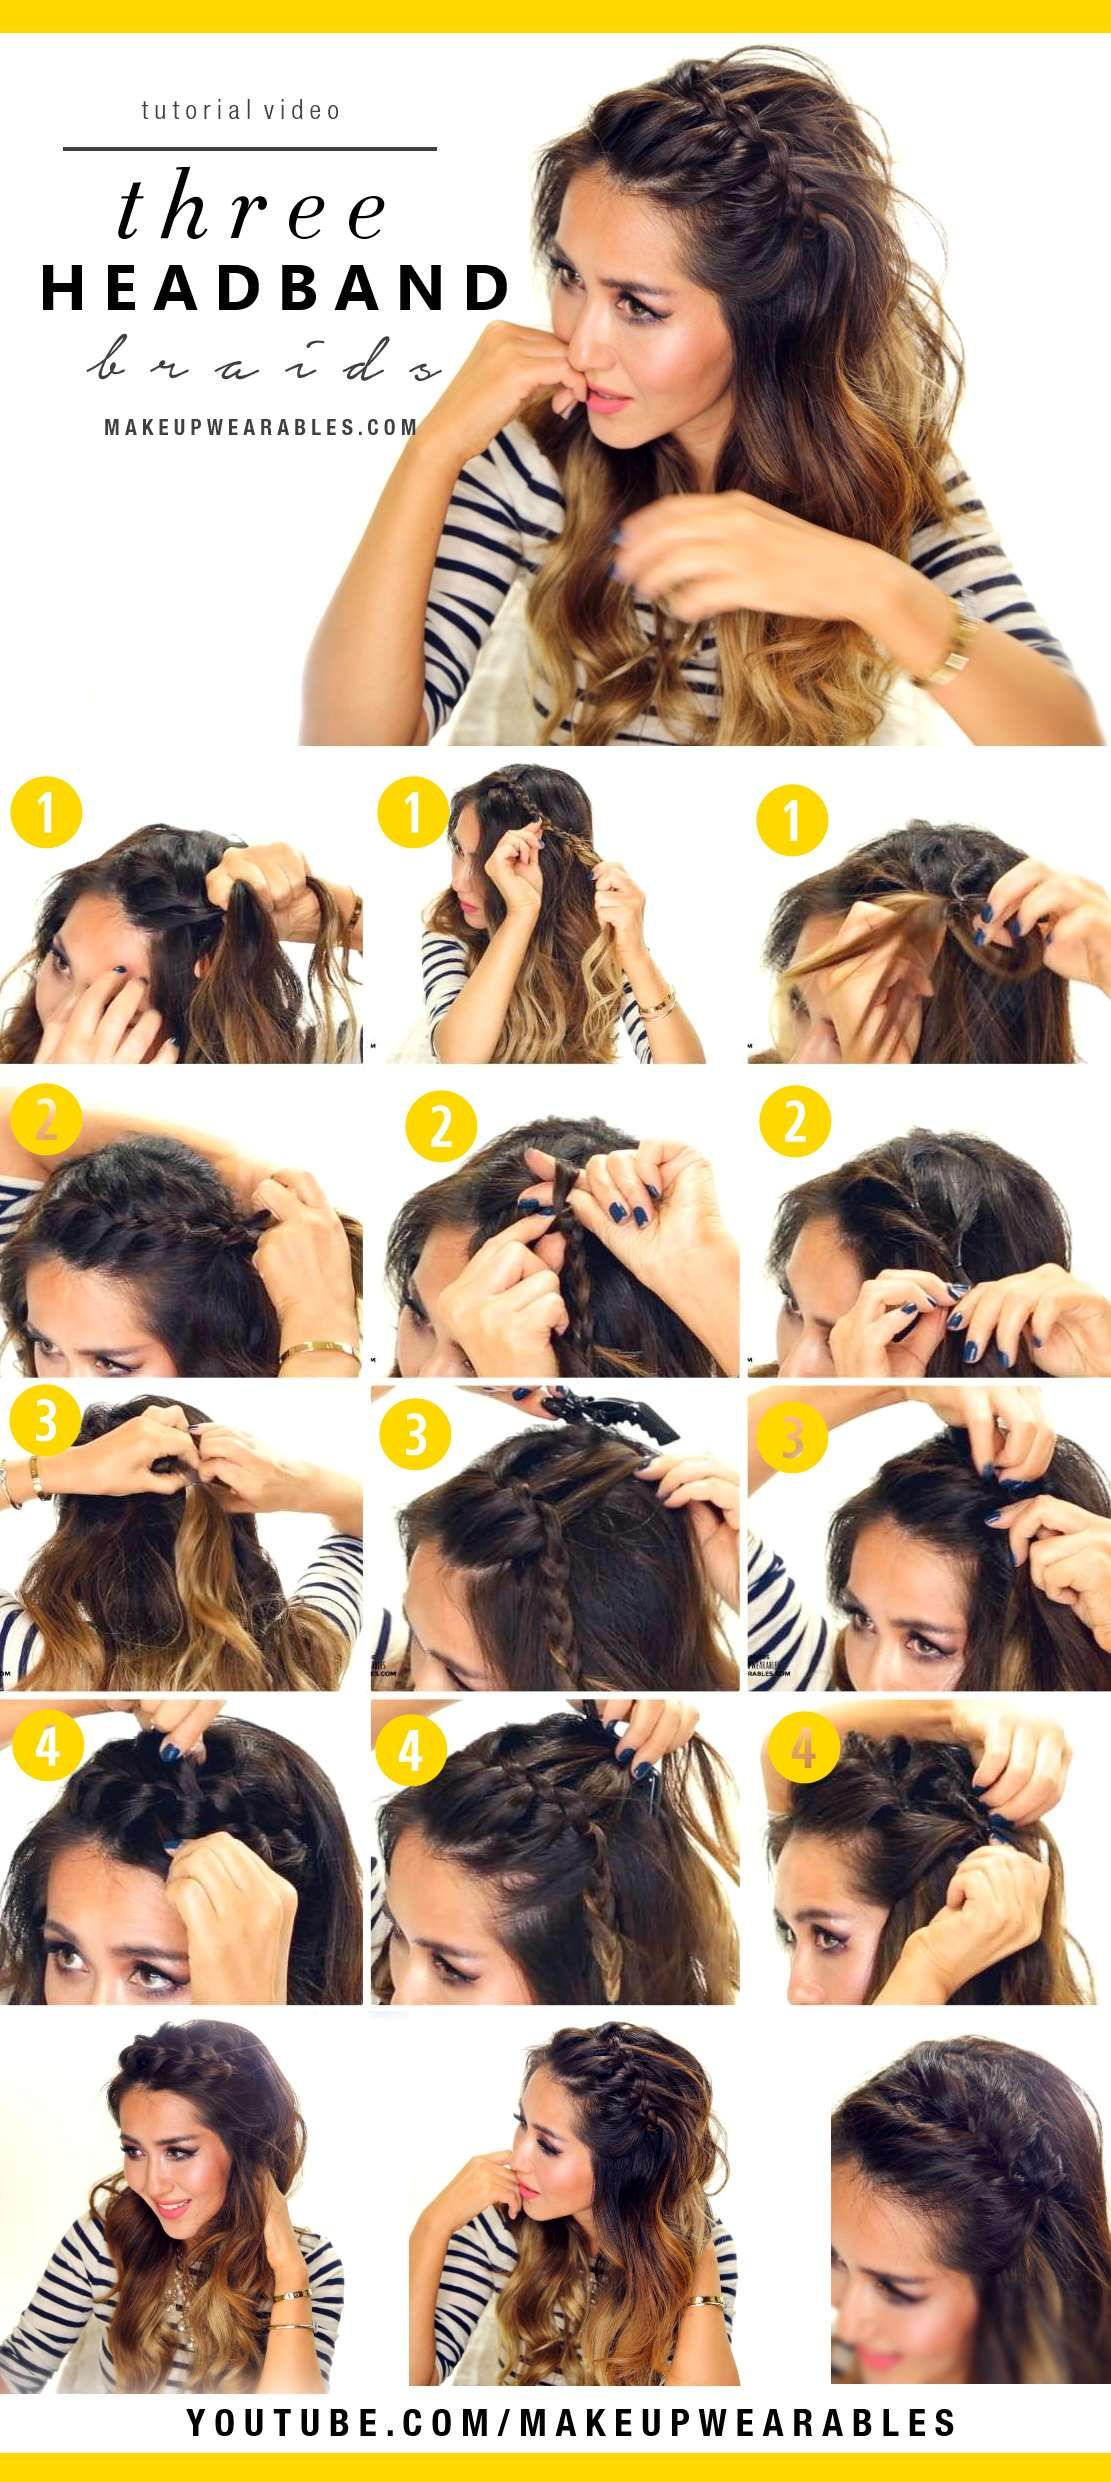 Pin by lucky valle on beautyhair pinterest headband braids